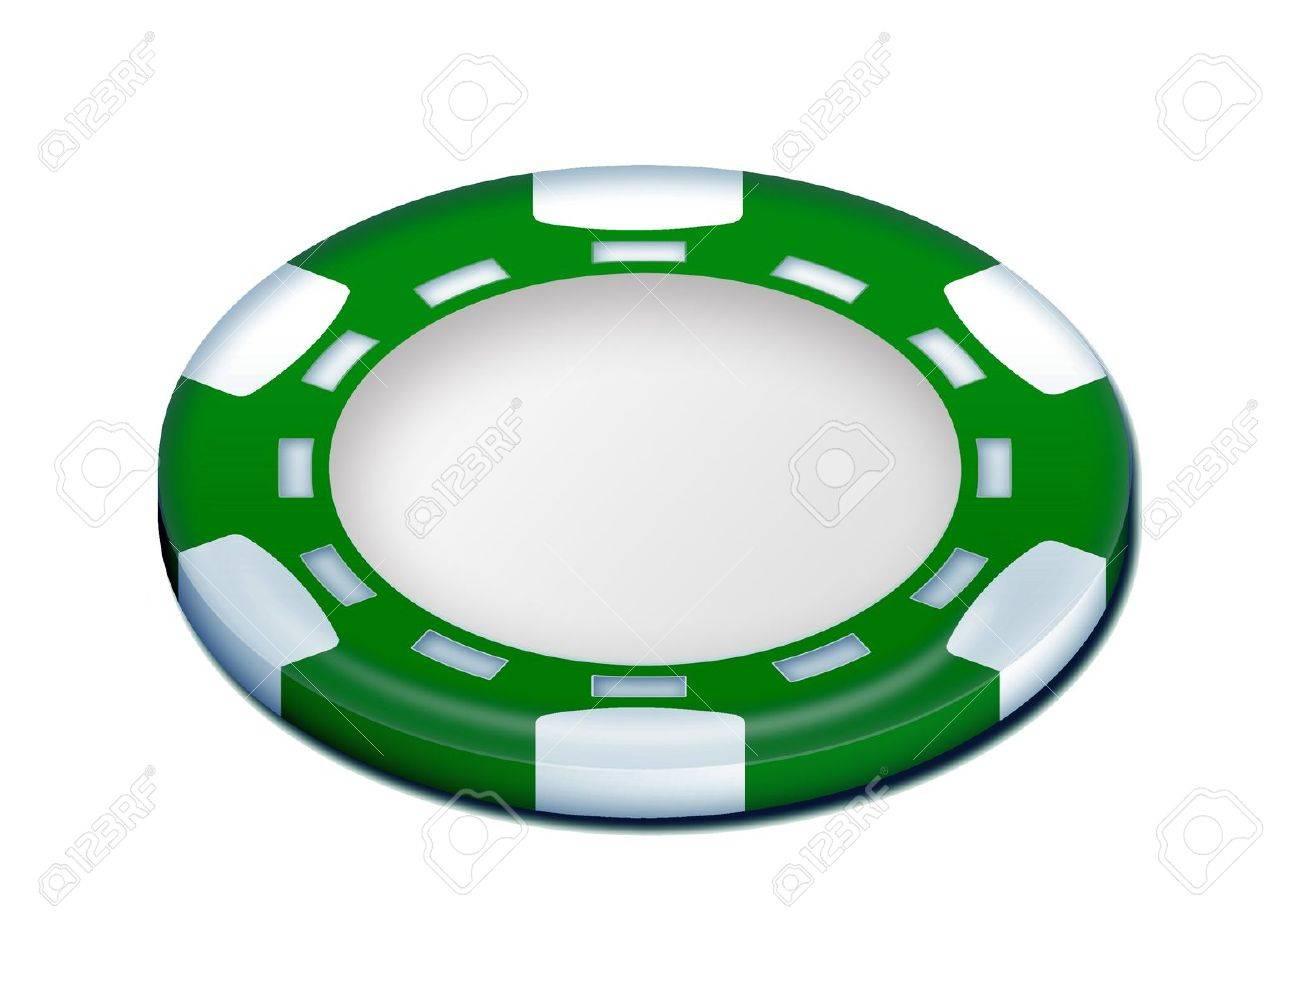 Casino chip and token casino marketing segmentation